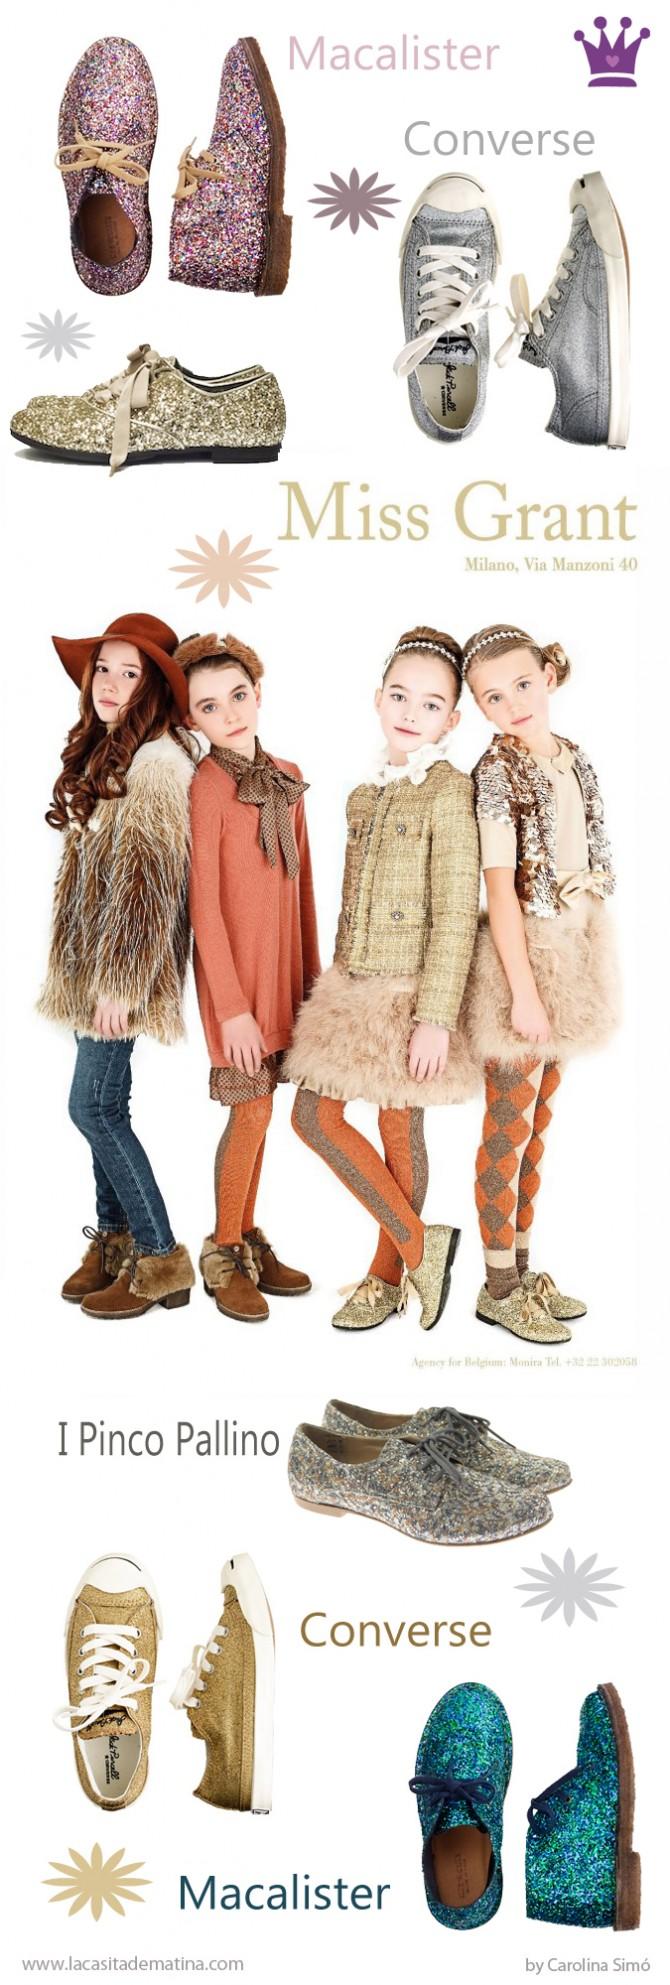 Miss Grant, Blog de Moda Infantil,   Pitti Bimbo, Carolina Simó